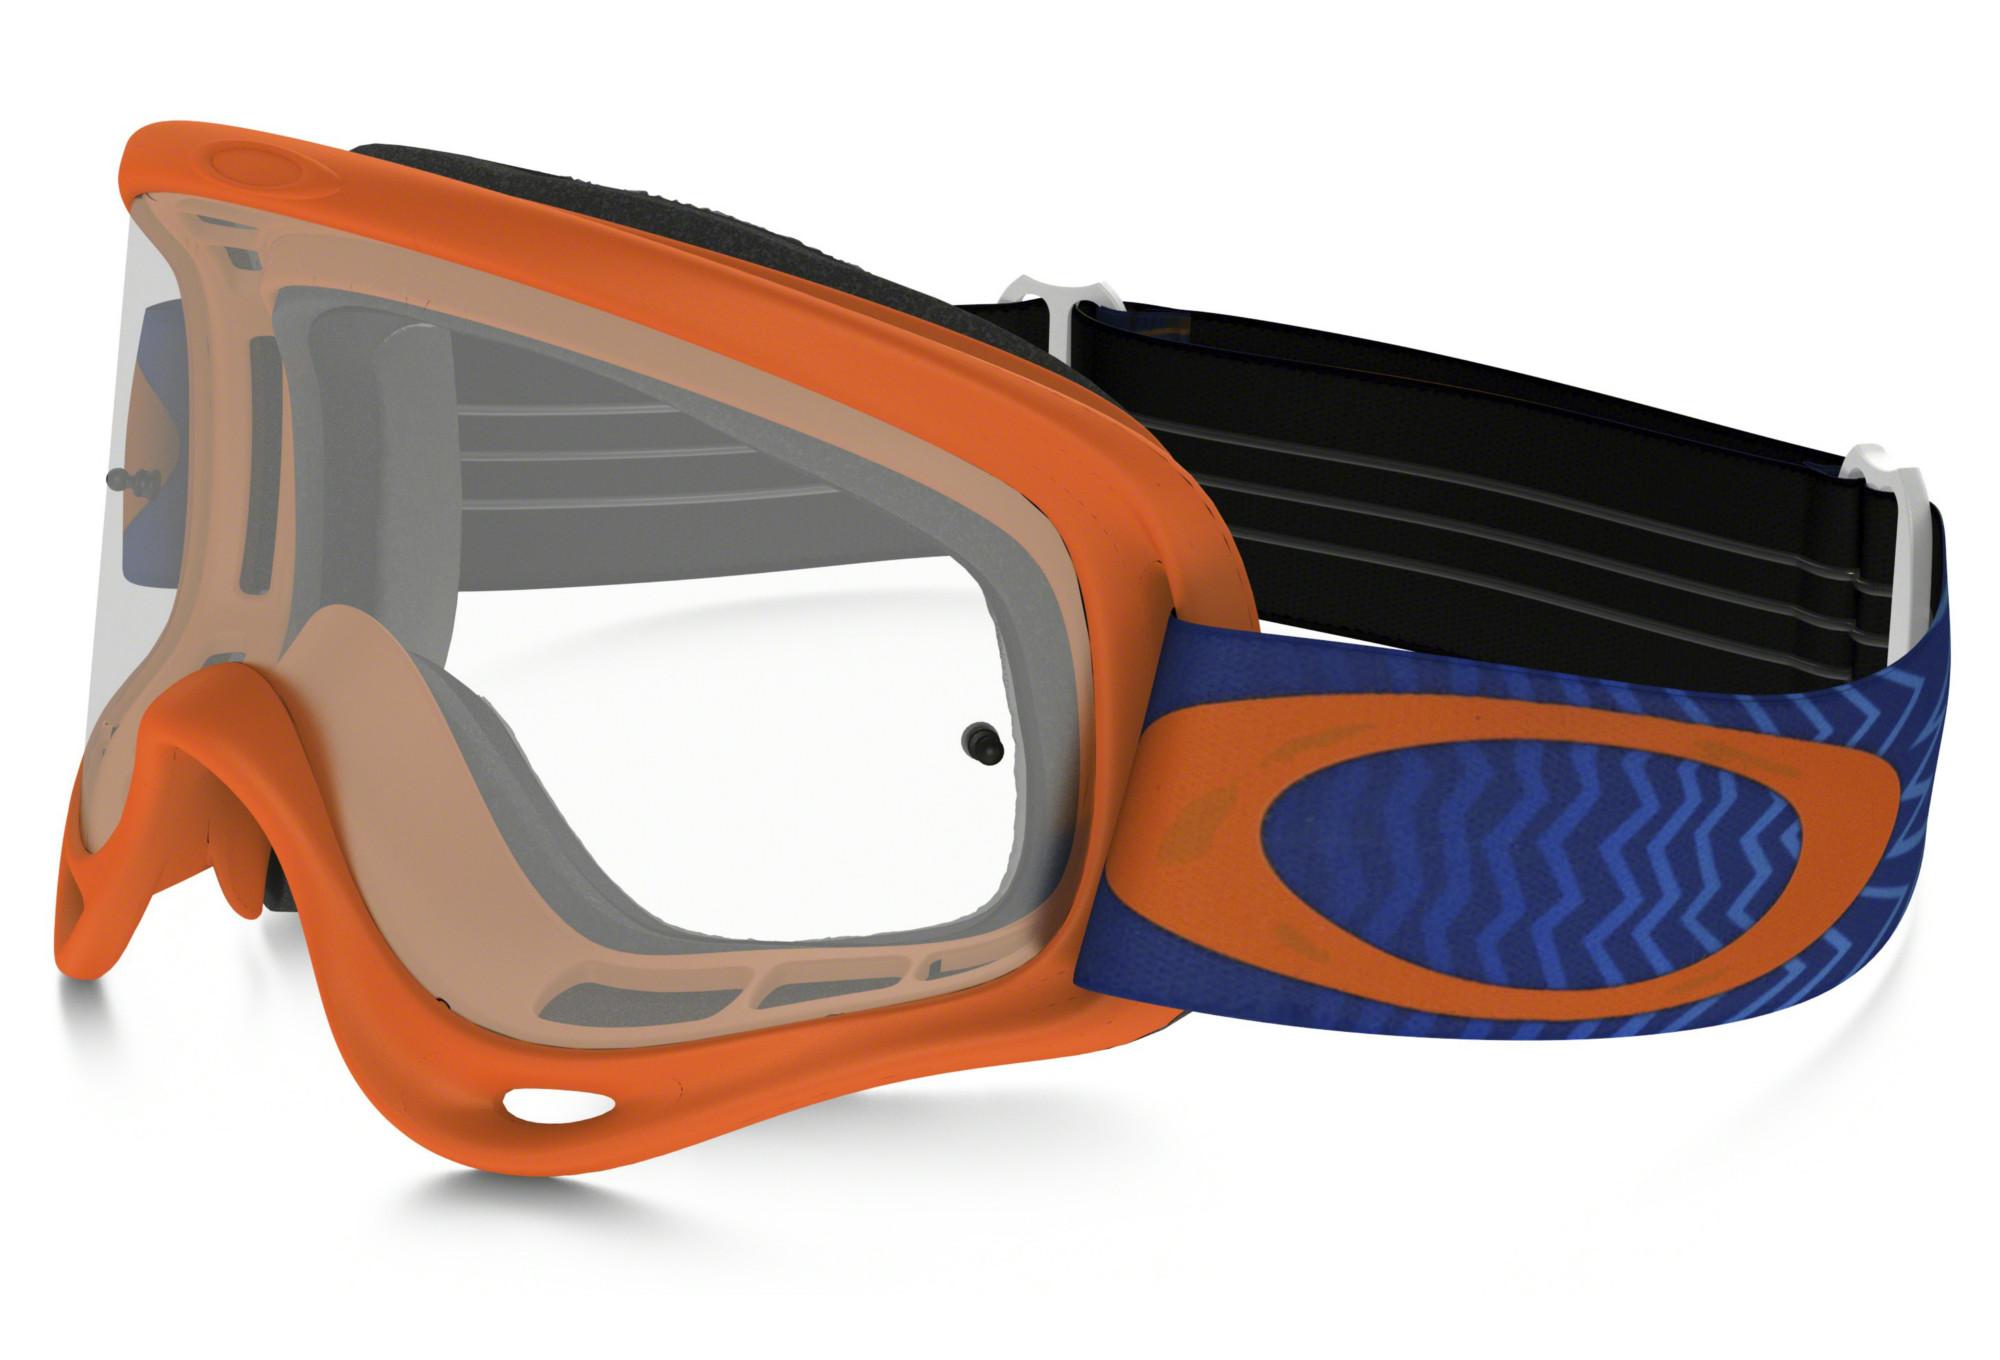 925a1091eb OAKLEY O FRAME MX SHOCKWAVE Goggle Orange Blue - Clear